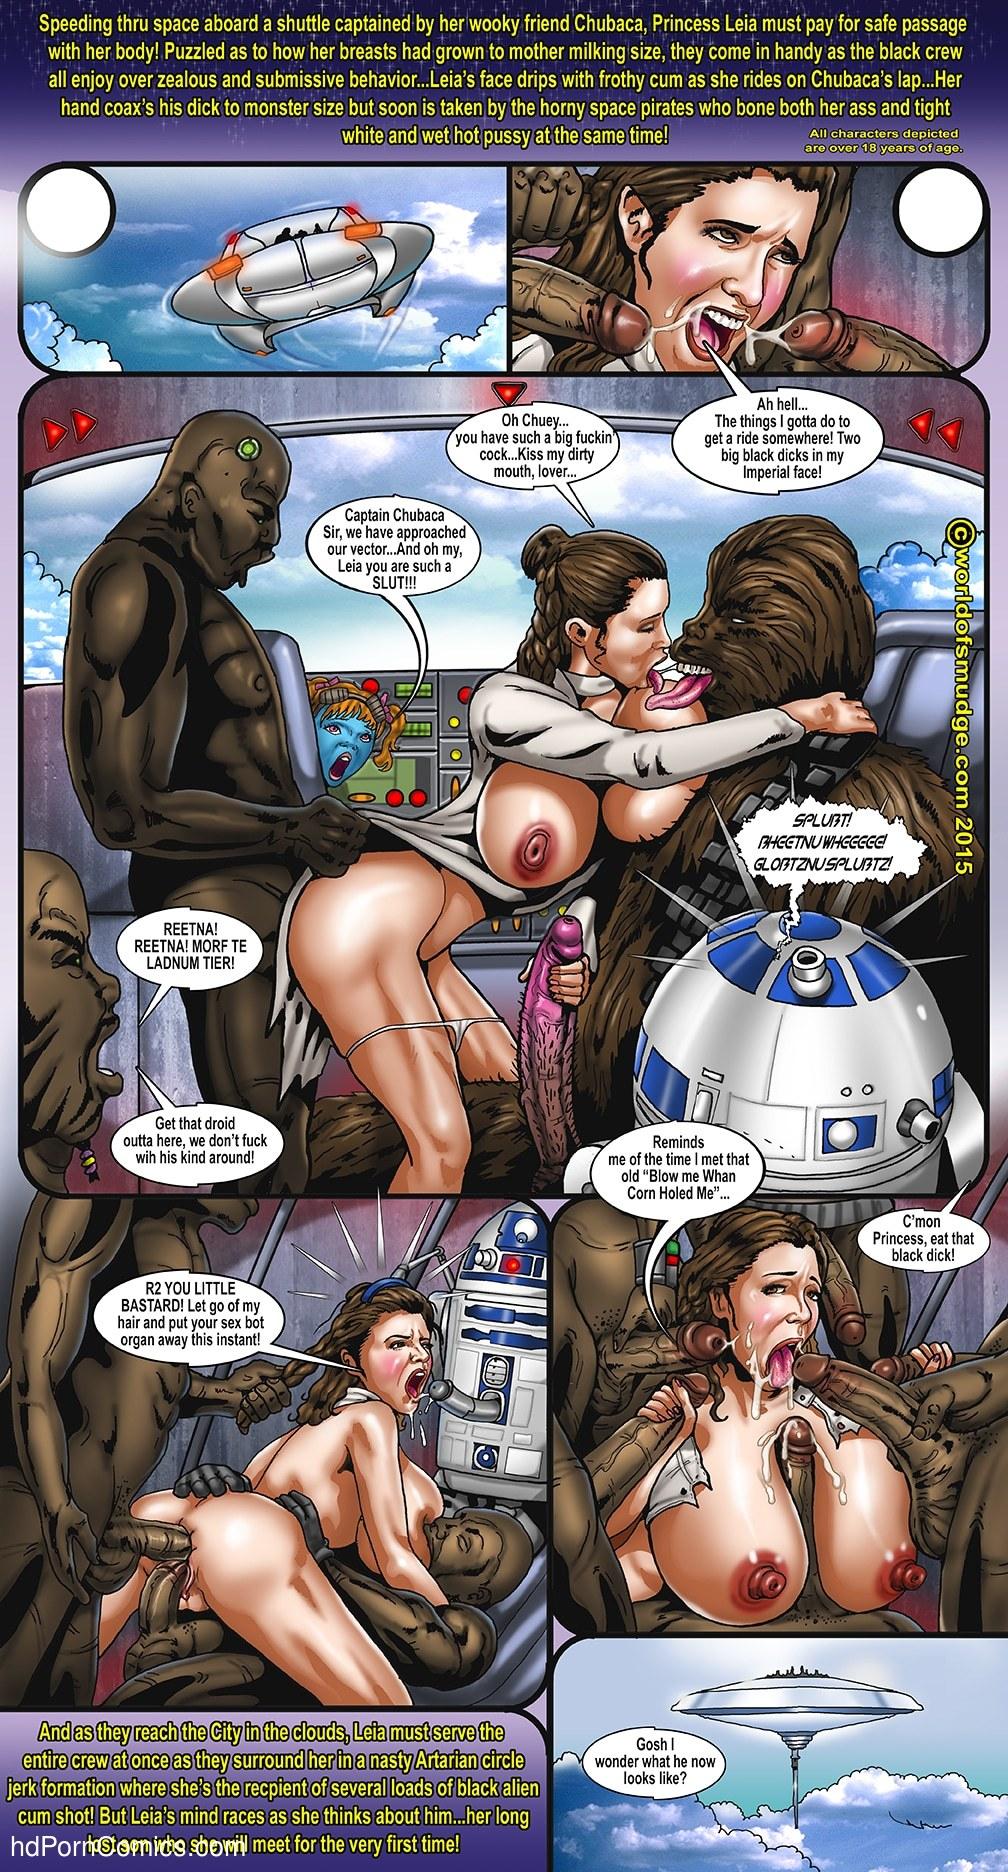 Star wars nude comic